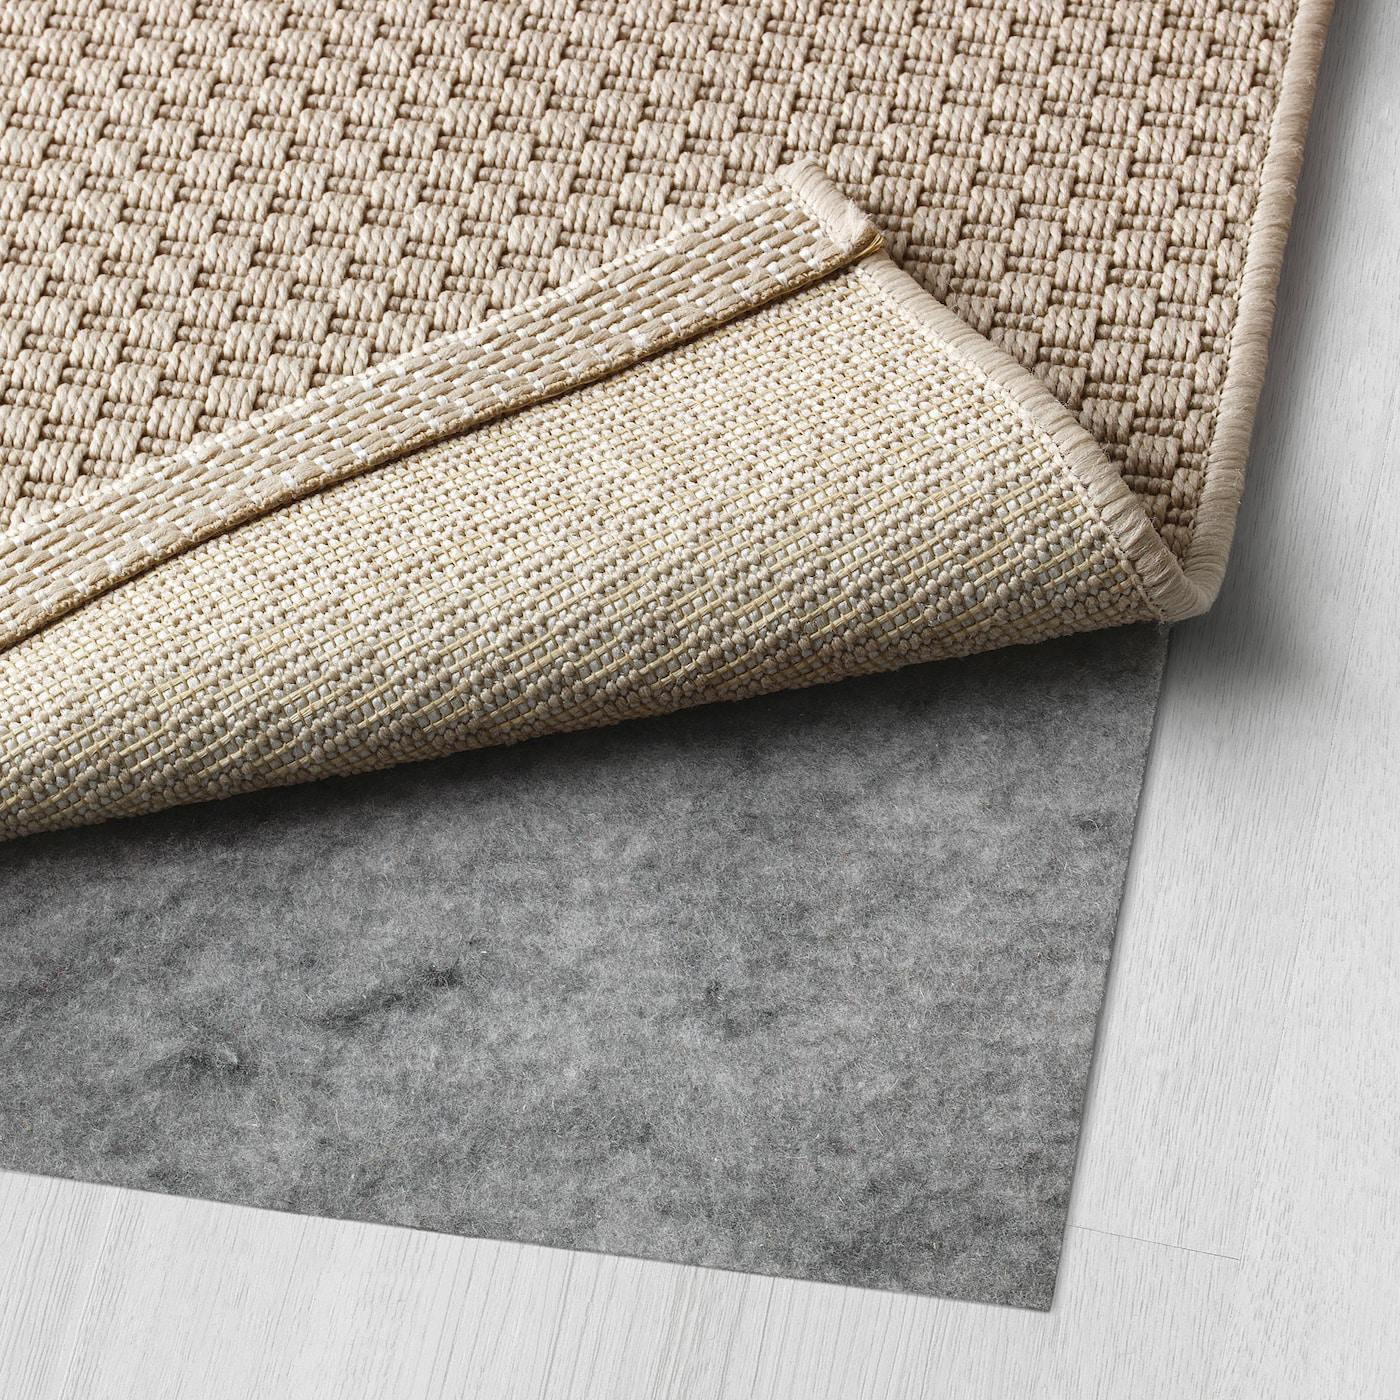 Morum Taeppe Fladvaevet Inde Ude Indendors Udendors Beige 200x300 Cm Ikea